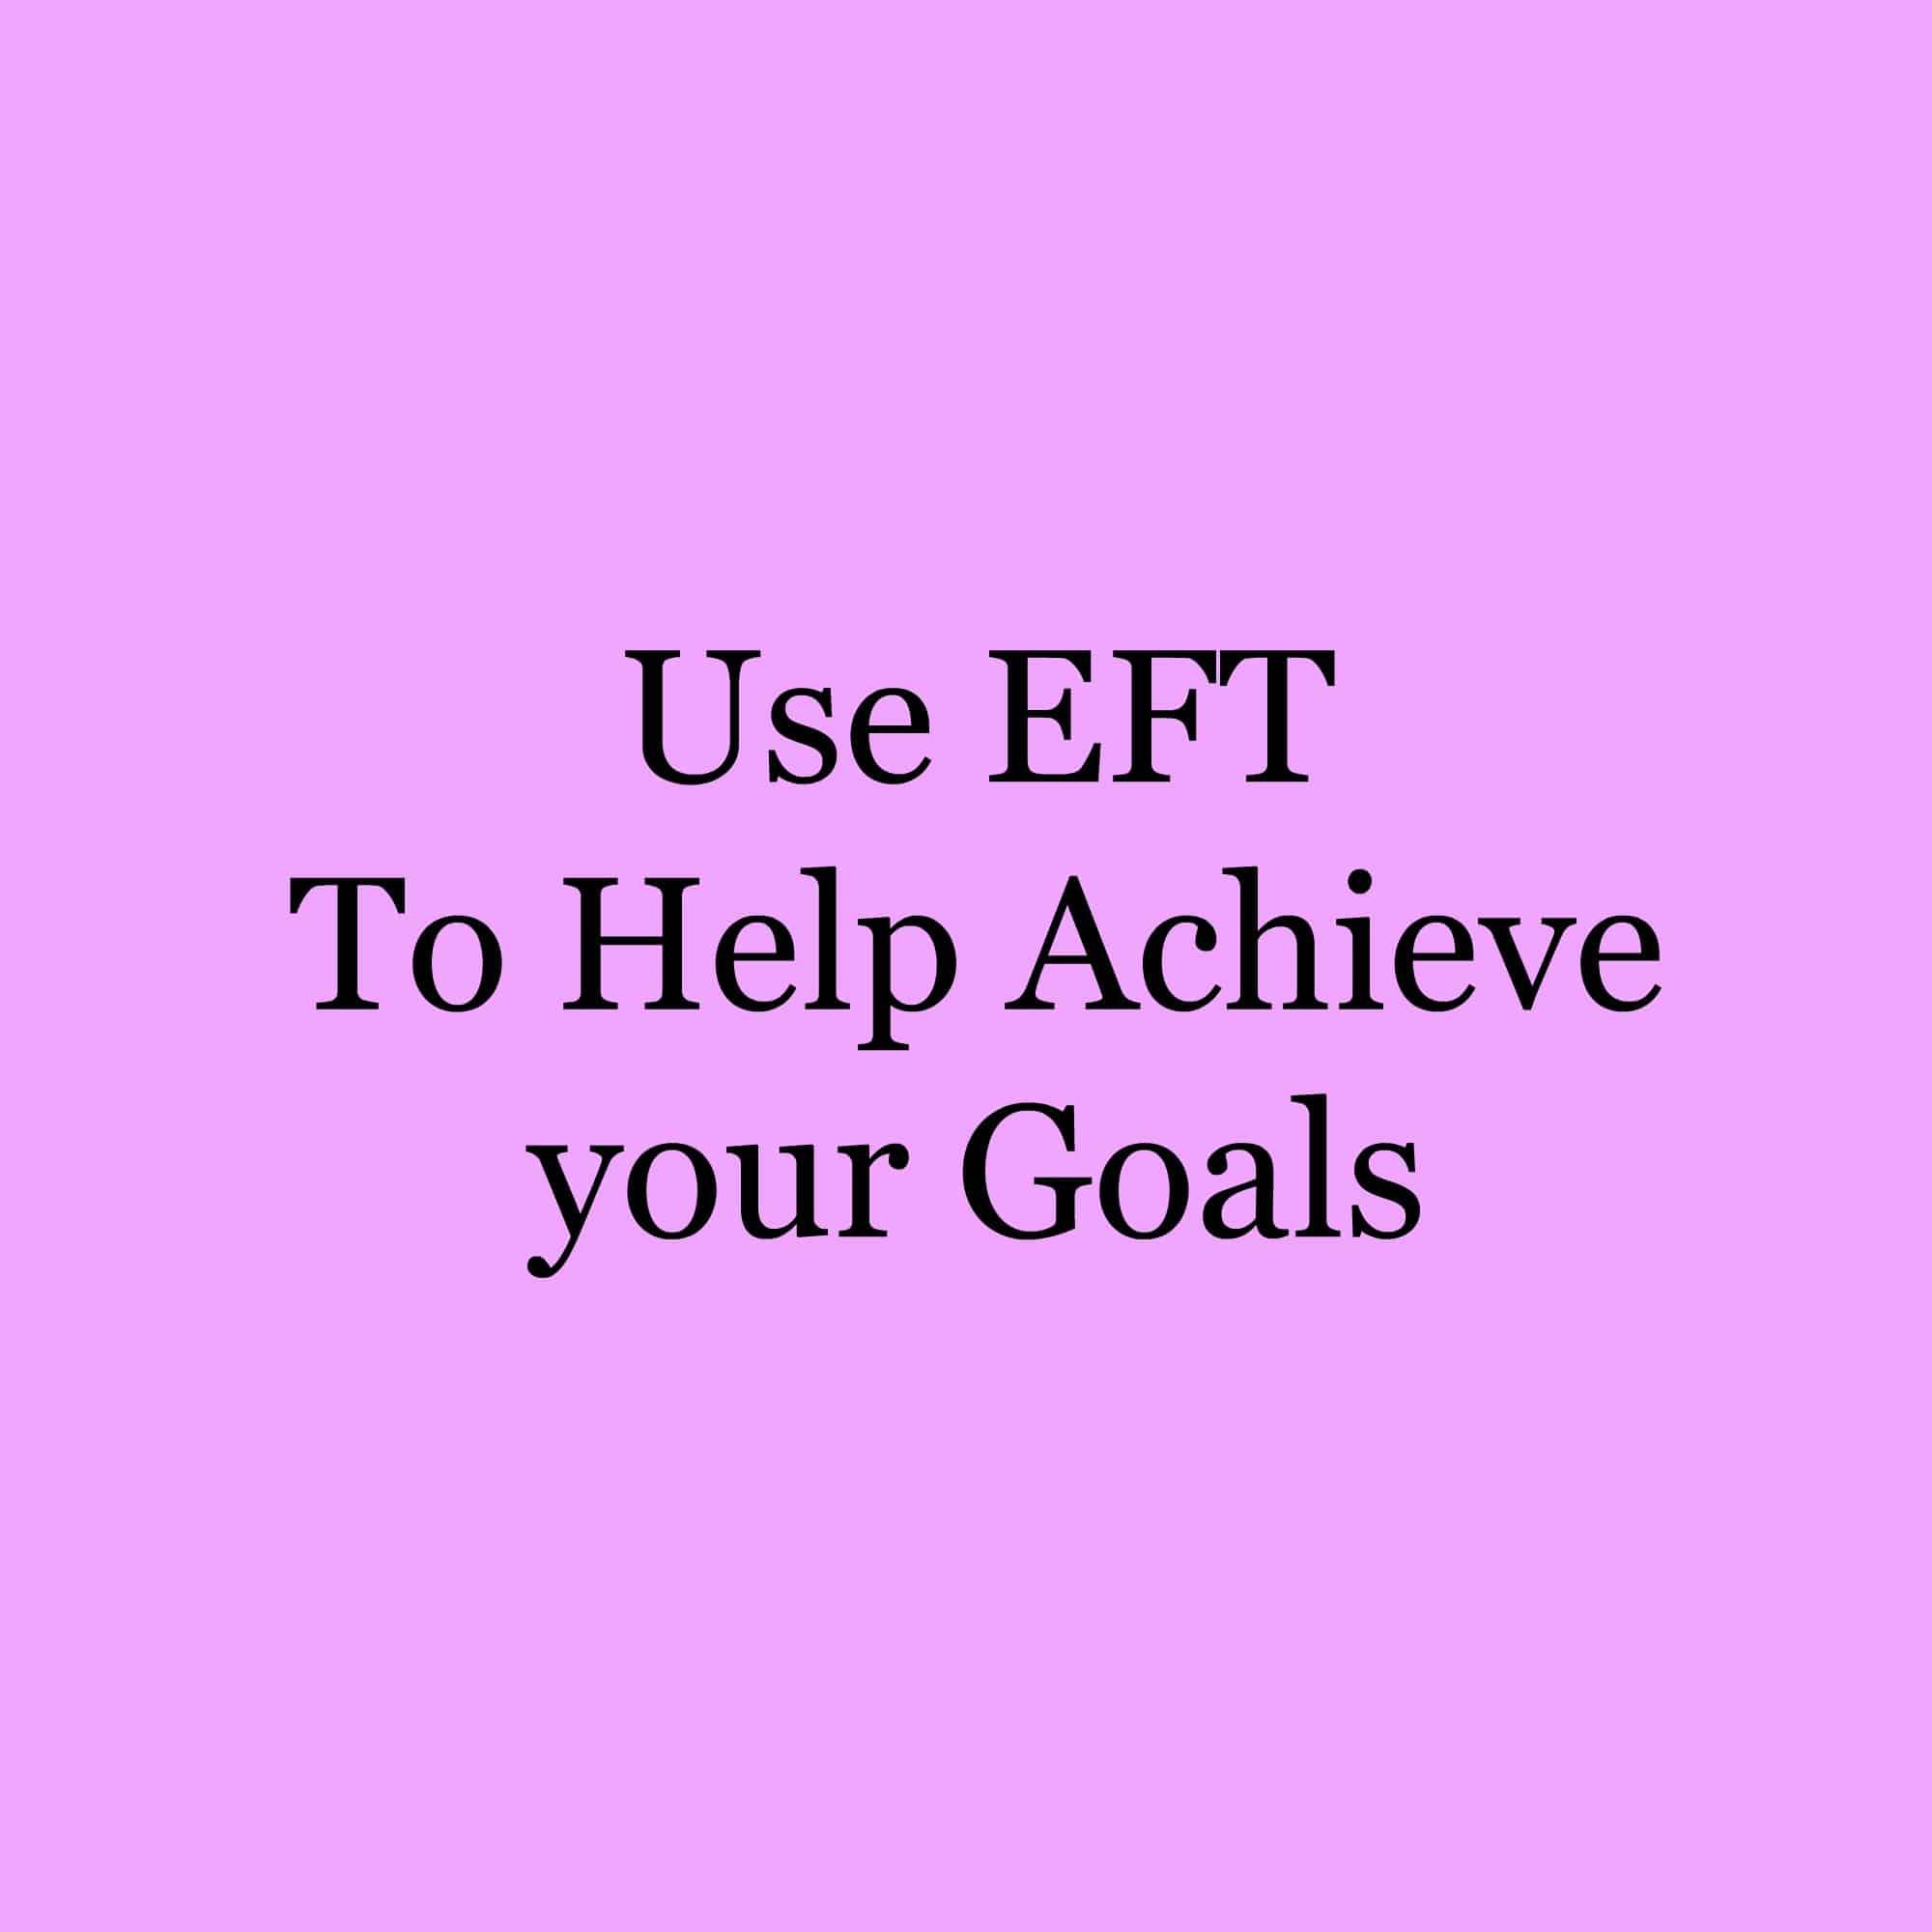 EFT for Goals ~ Release negative beliefs and emotions using EFT (Emotional Freedom Techniques).